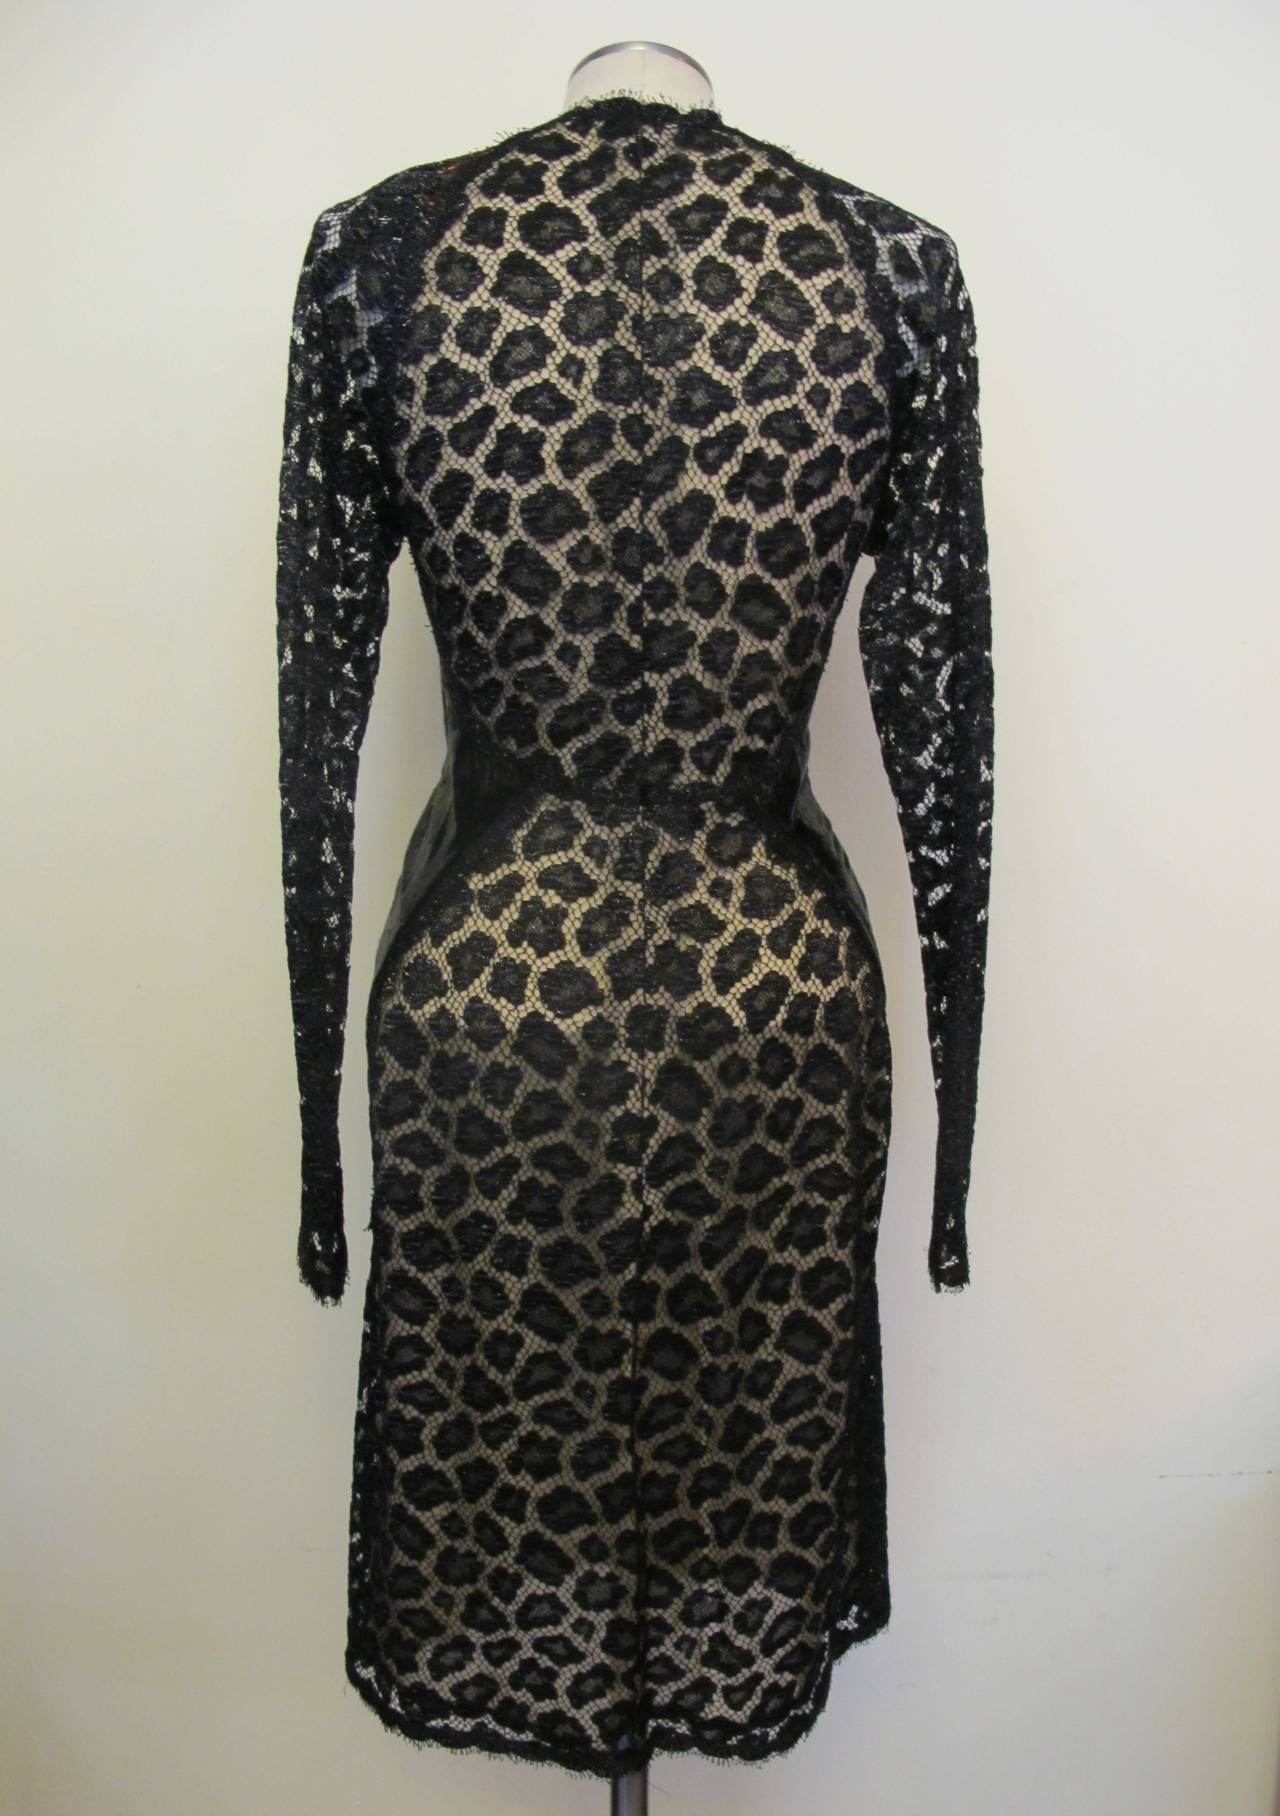 Geoffrey Beene Black Lace Cocktail Dress with Leopard Design 5